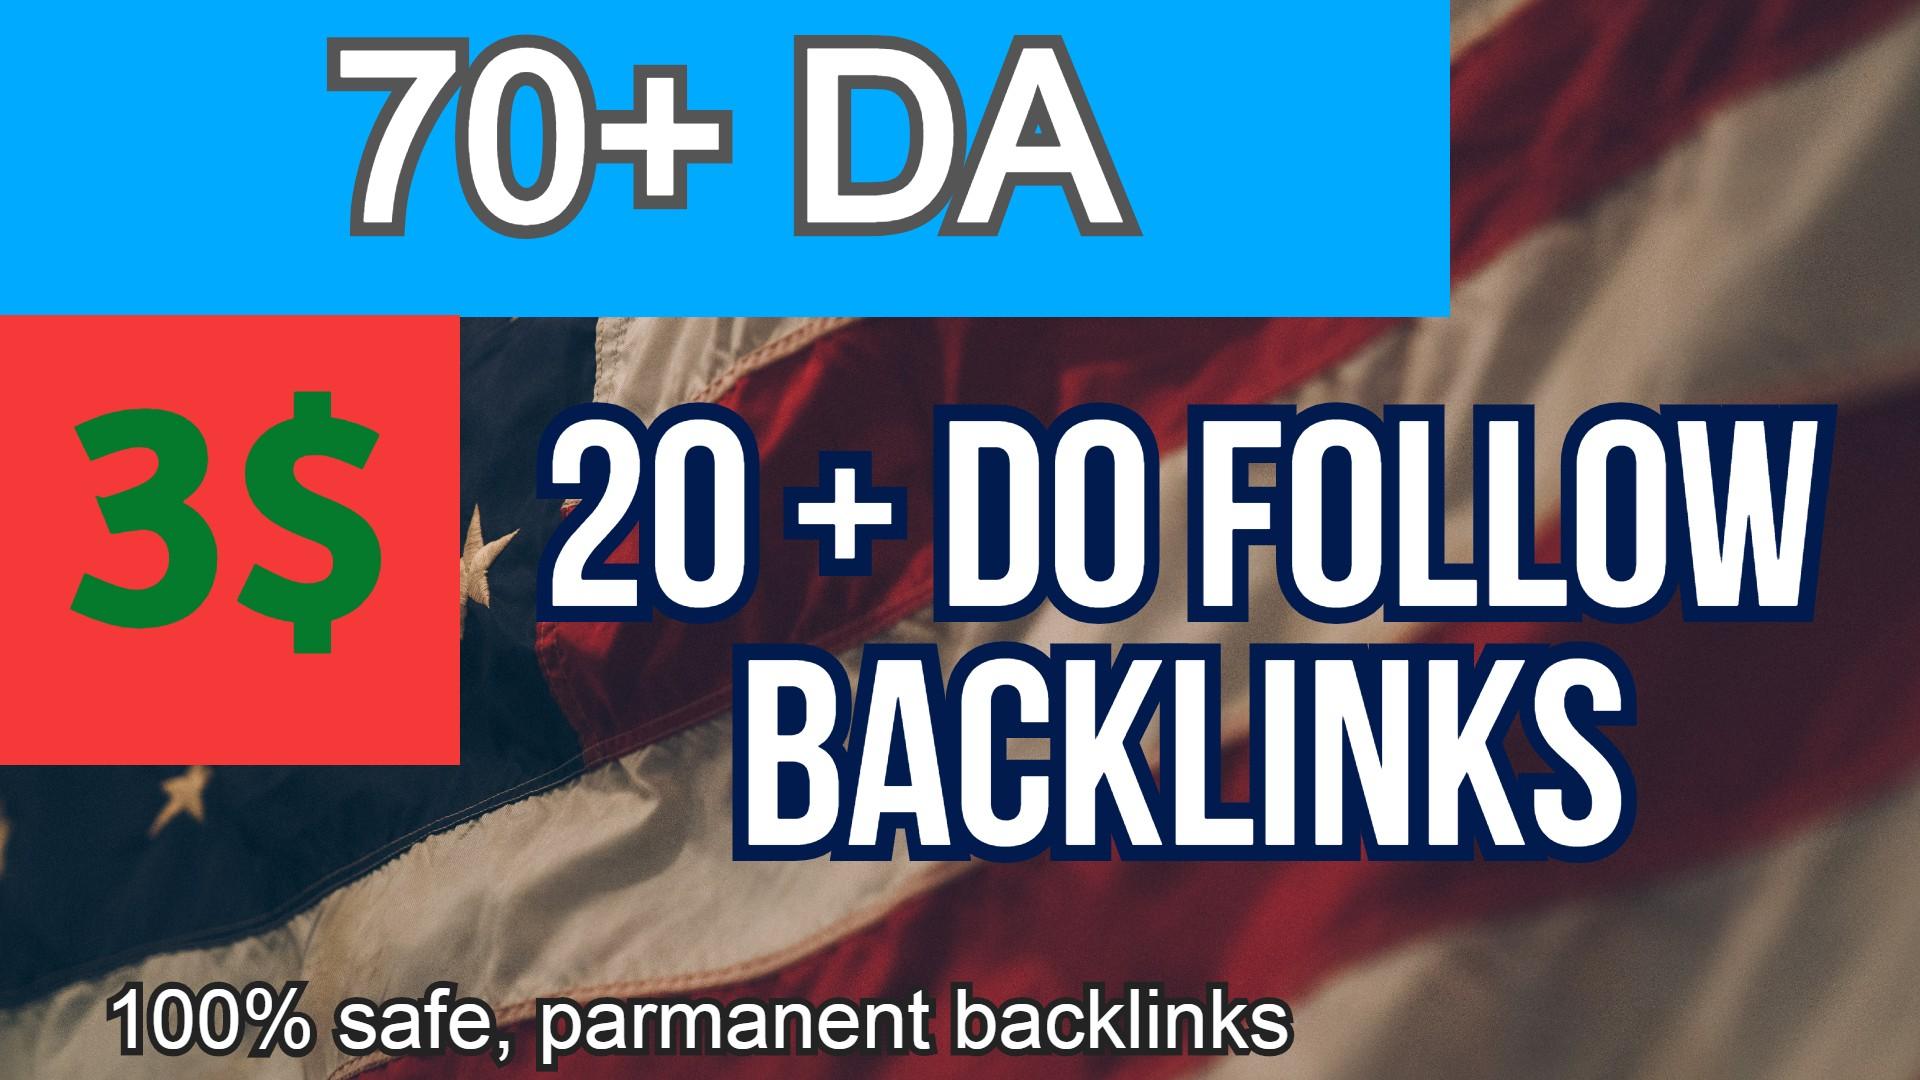 20+ POWERFULL PBN WEB 2.0 Backlinks 70+ DA 35+ PA GET IT NOW